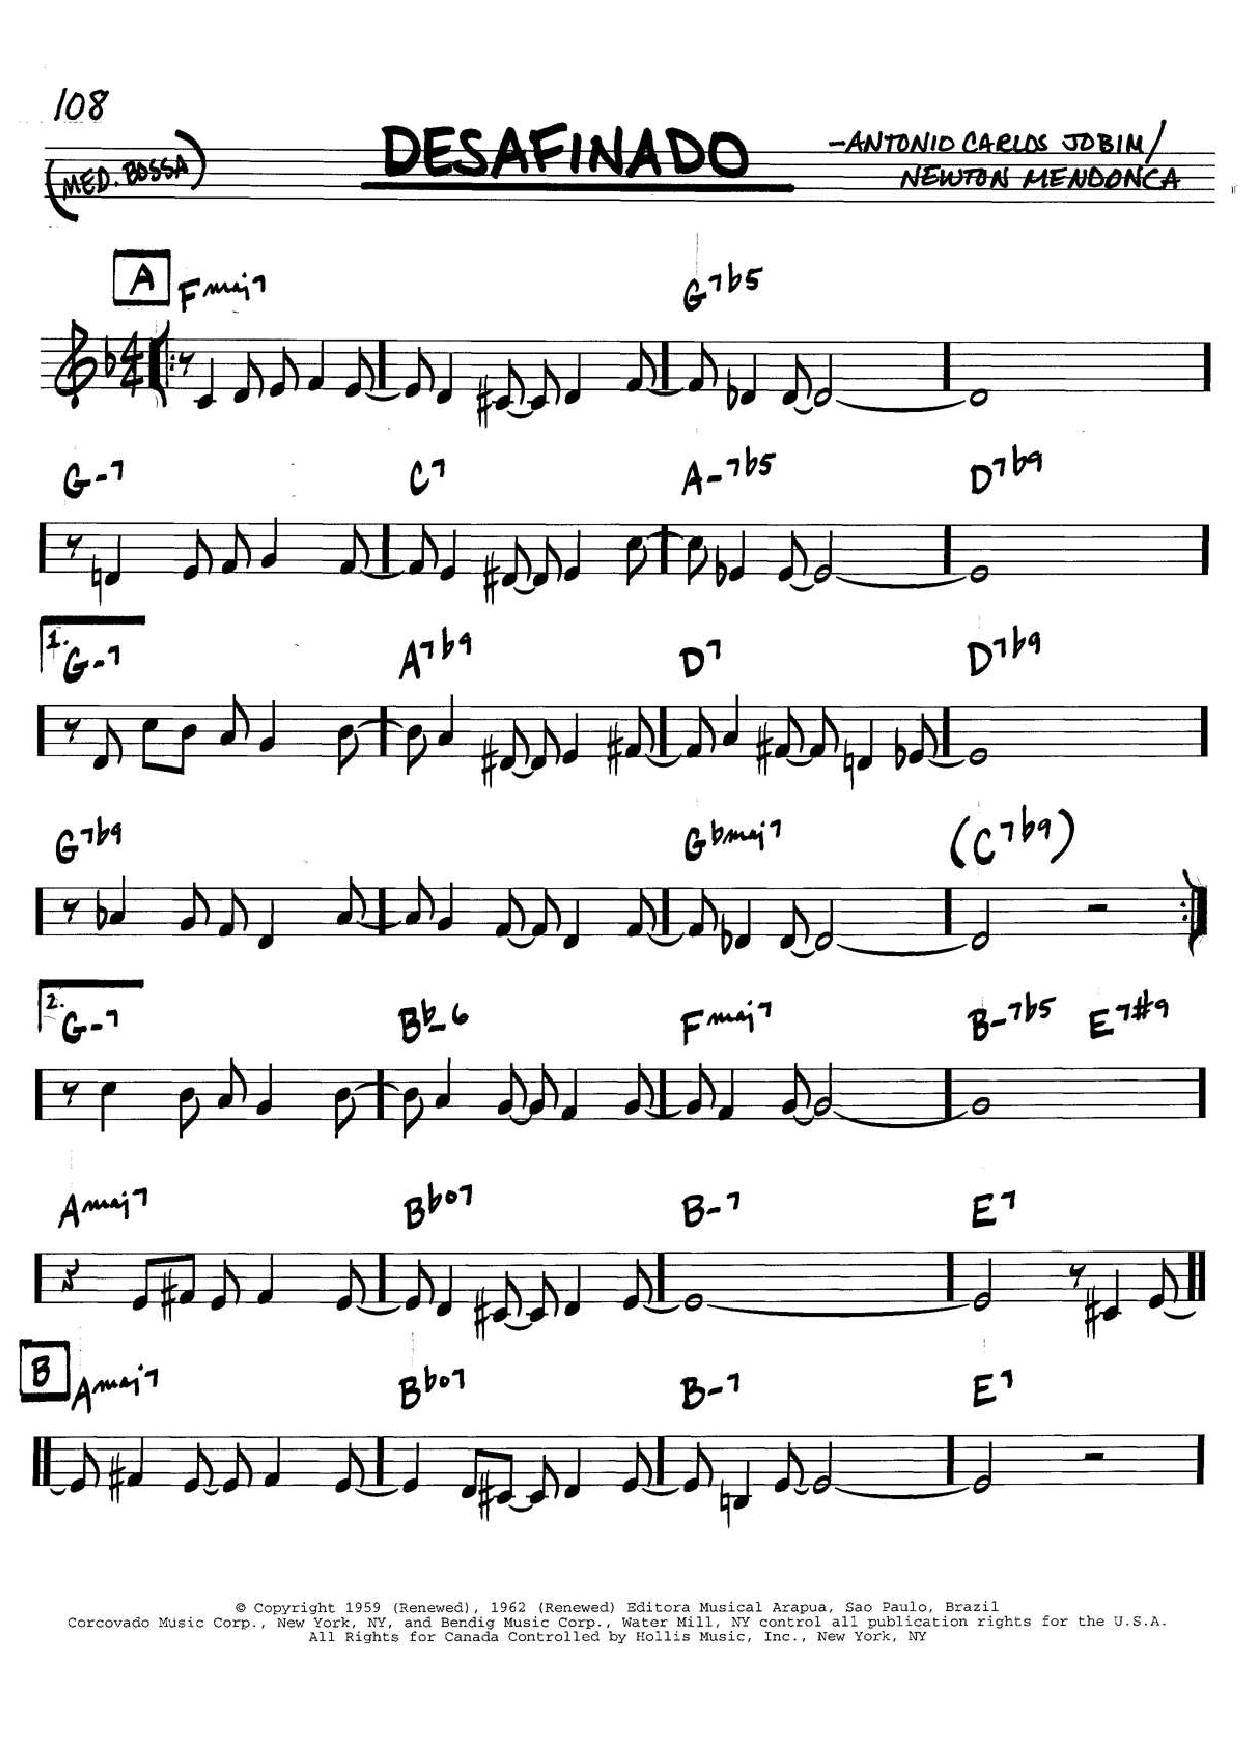 Desafinado sheet music